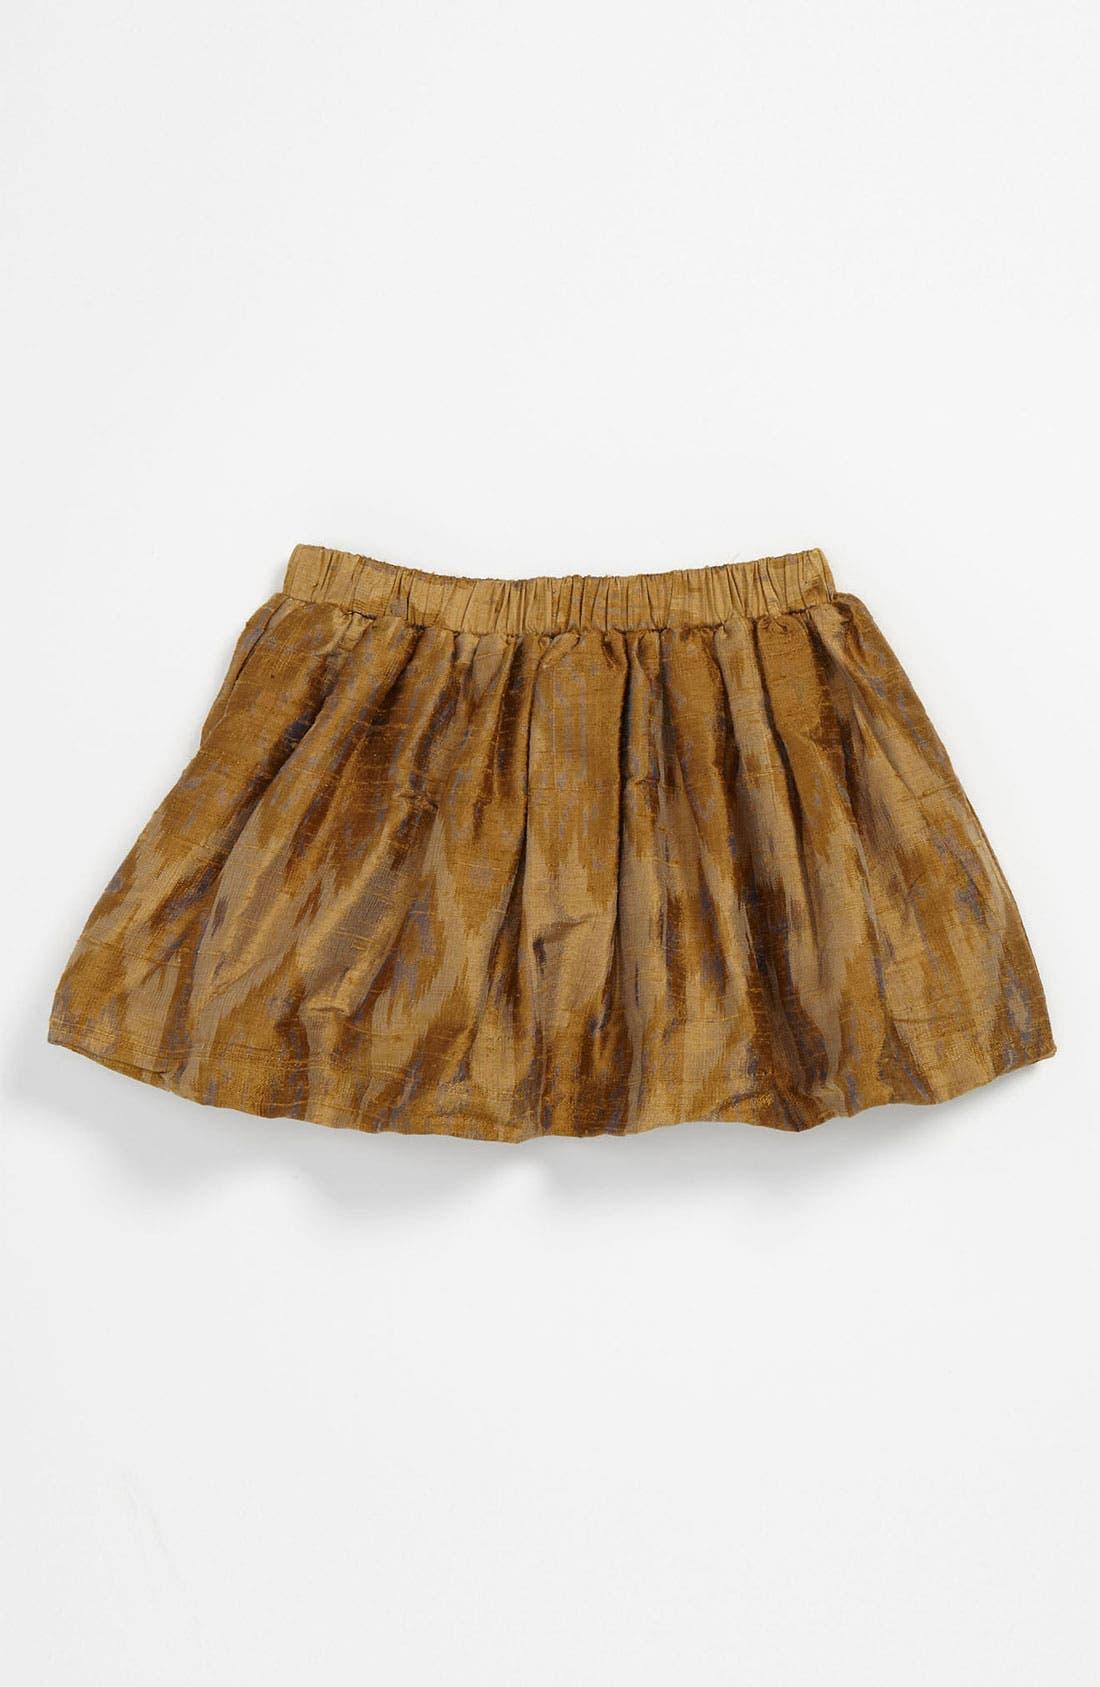 Alternate Image 1 Selected - Peek 'Olivia' Skirt (Infant)